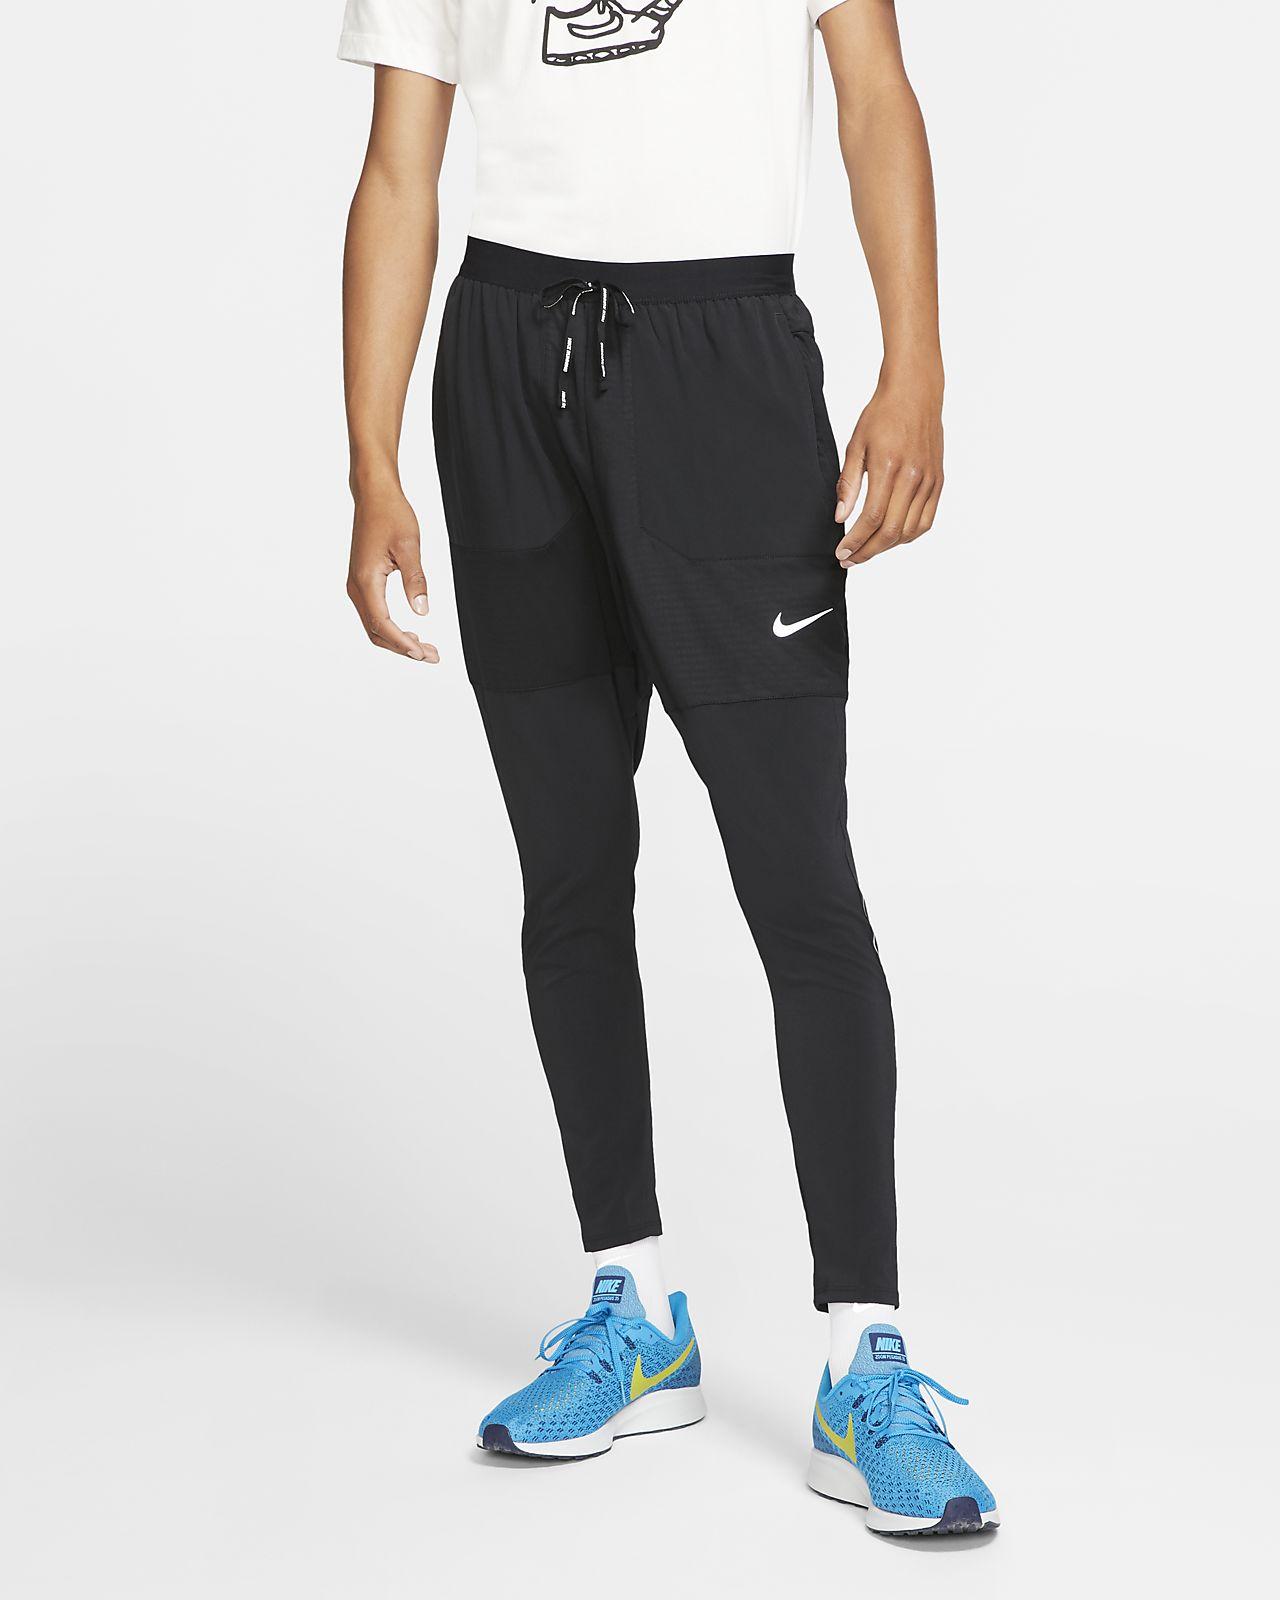 fashion sale performance sportswear Nike Phenom Herren-Laufhose